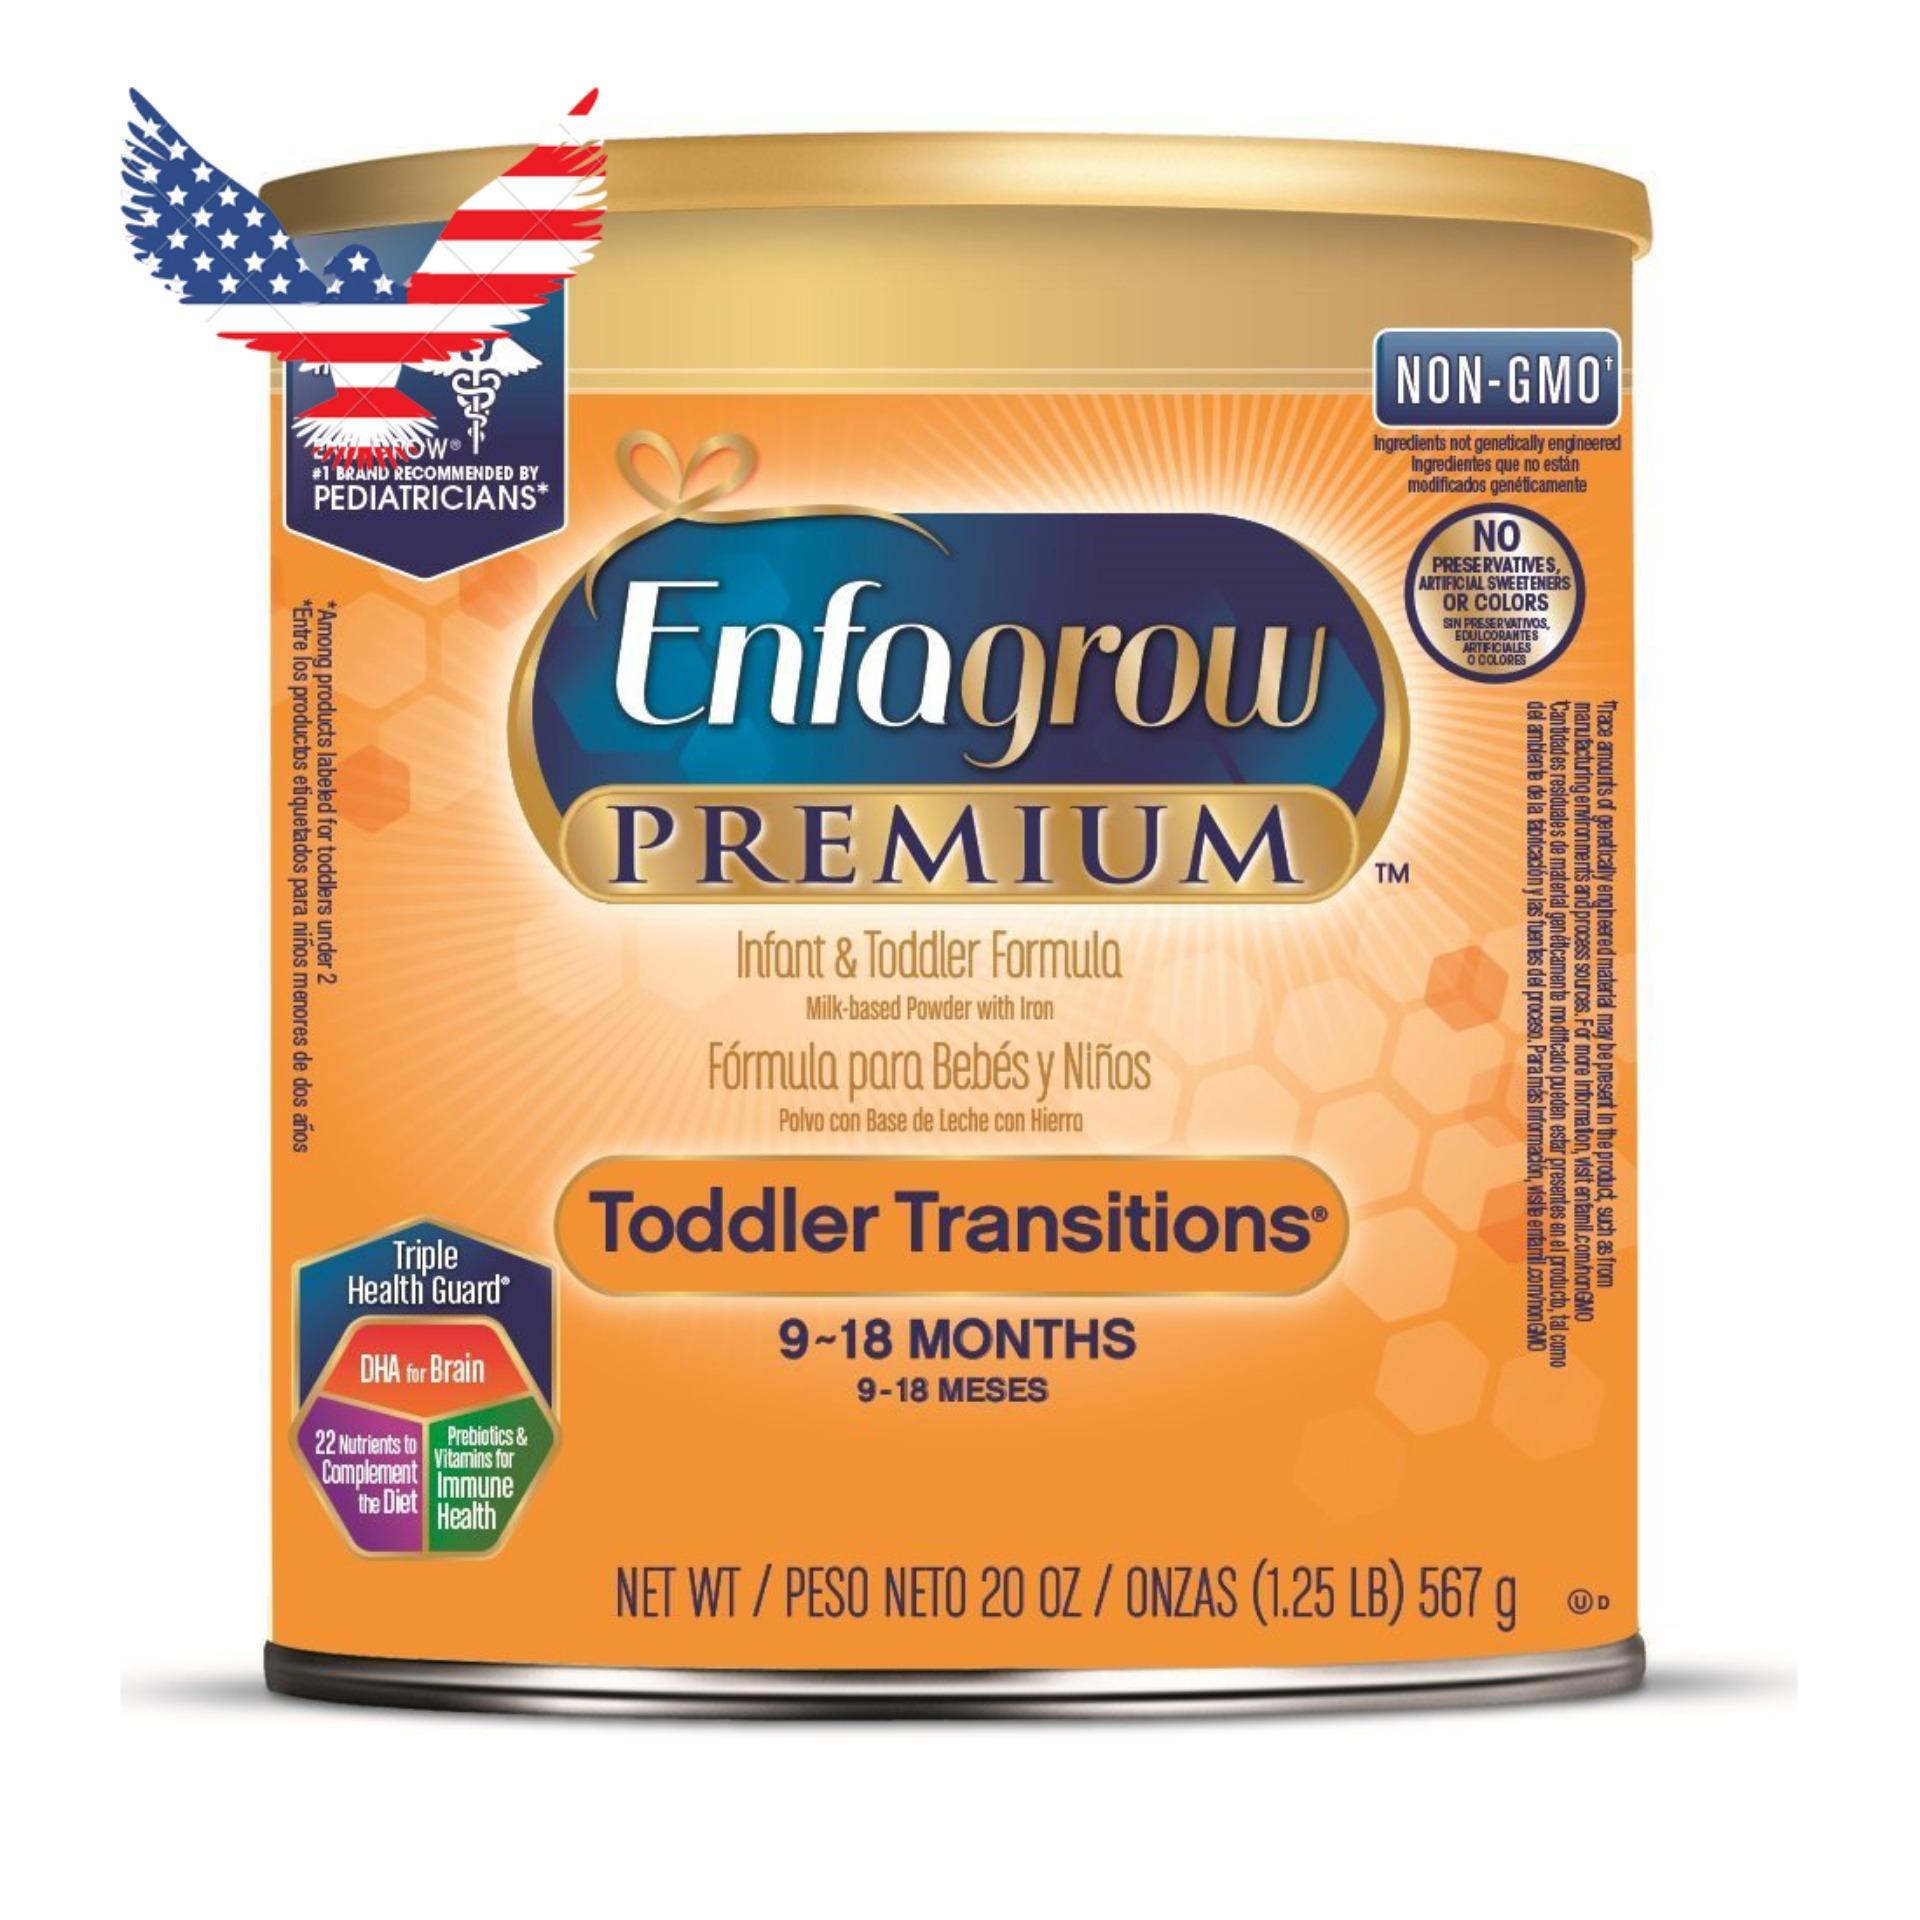 Mã Khuyến Mại Sữa Enfagrow Cho Trẻ Từ 9 18 Thang Tuổi Enfagrow Premium Infant Toddler Formula Non Gmo 567G Mỹ